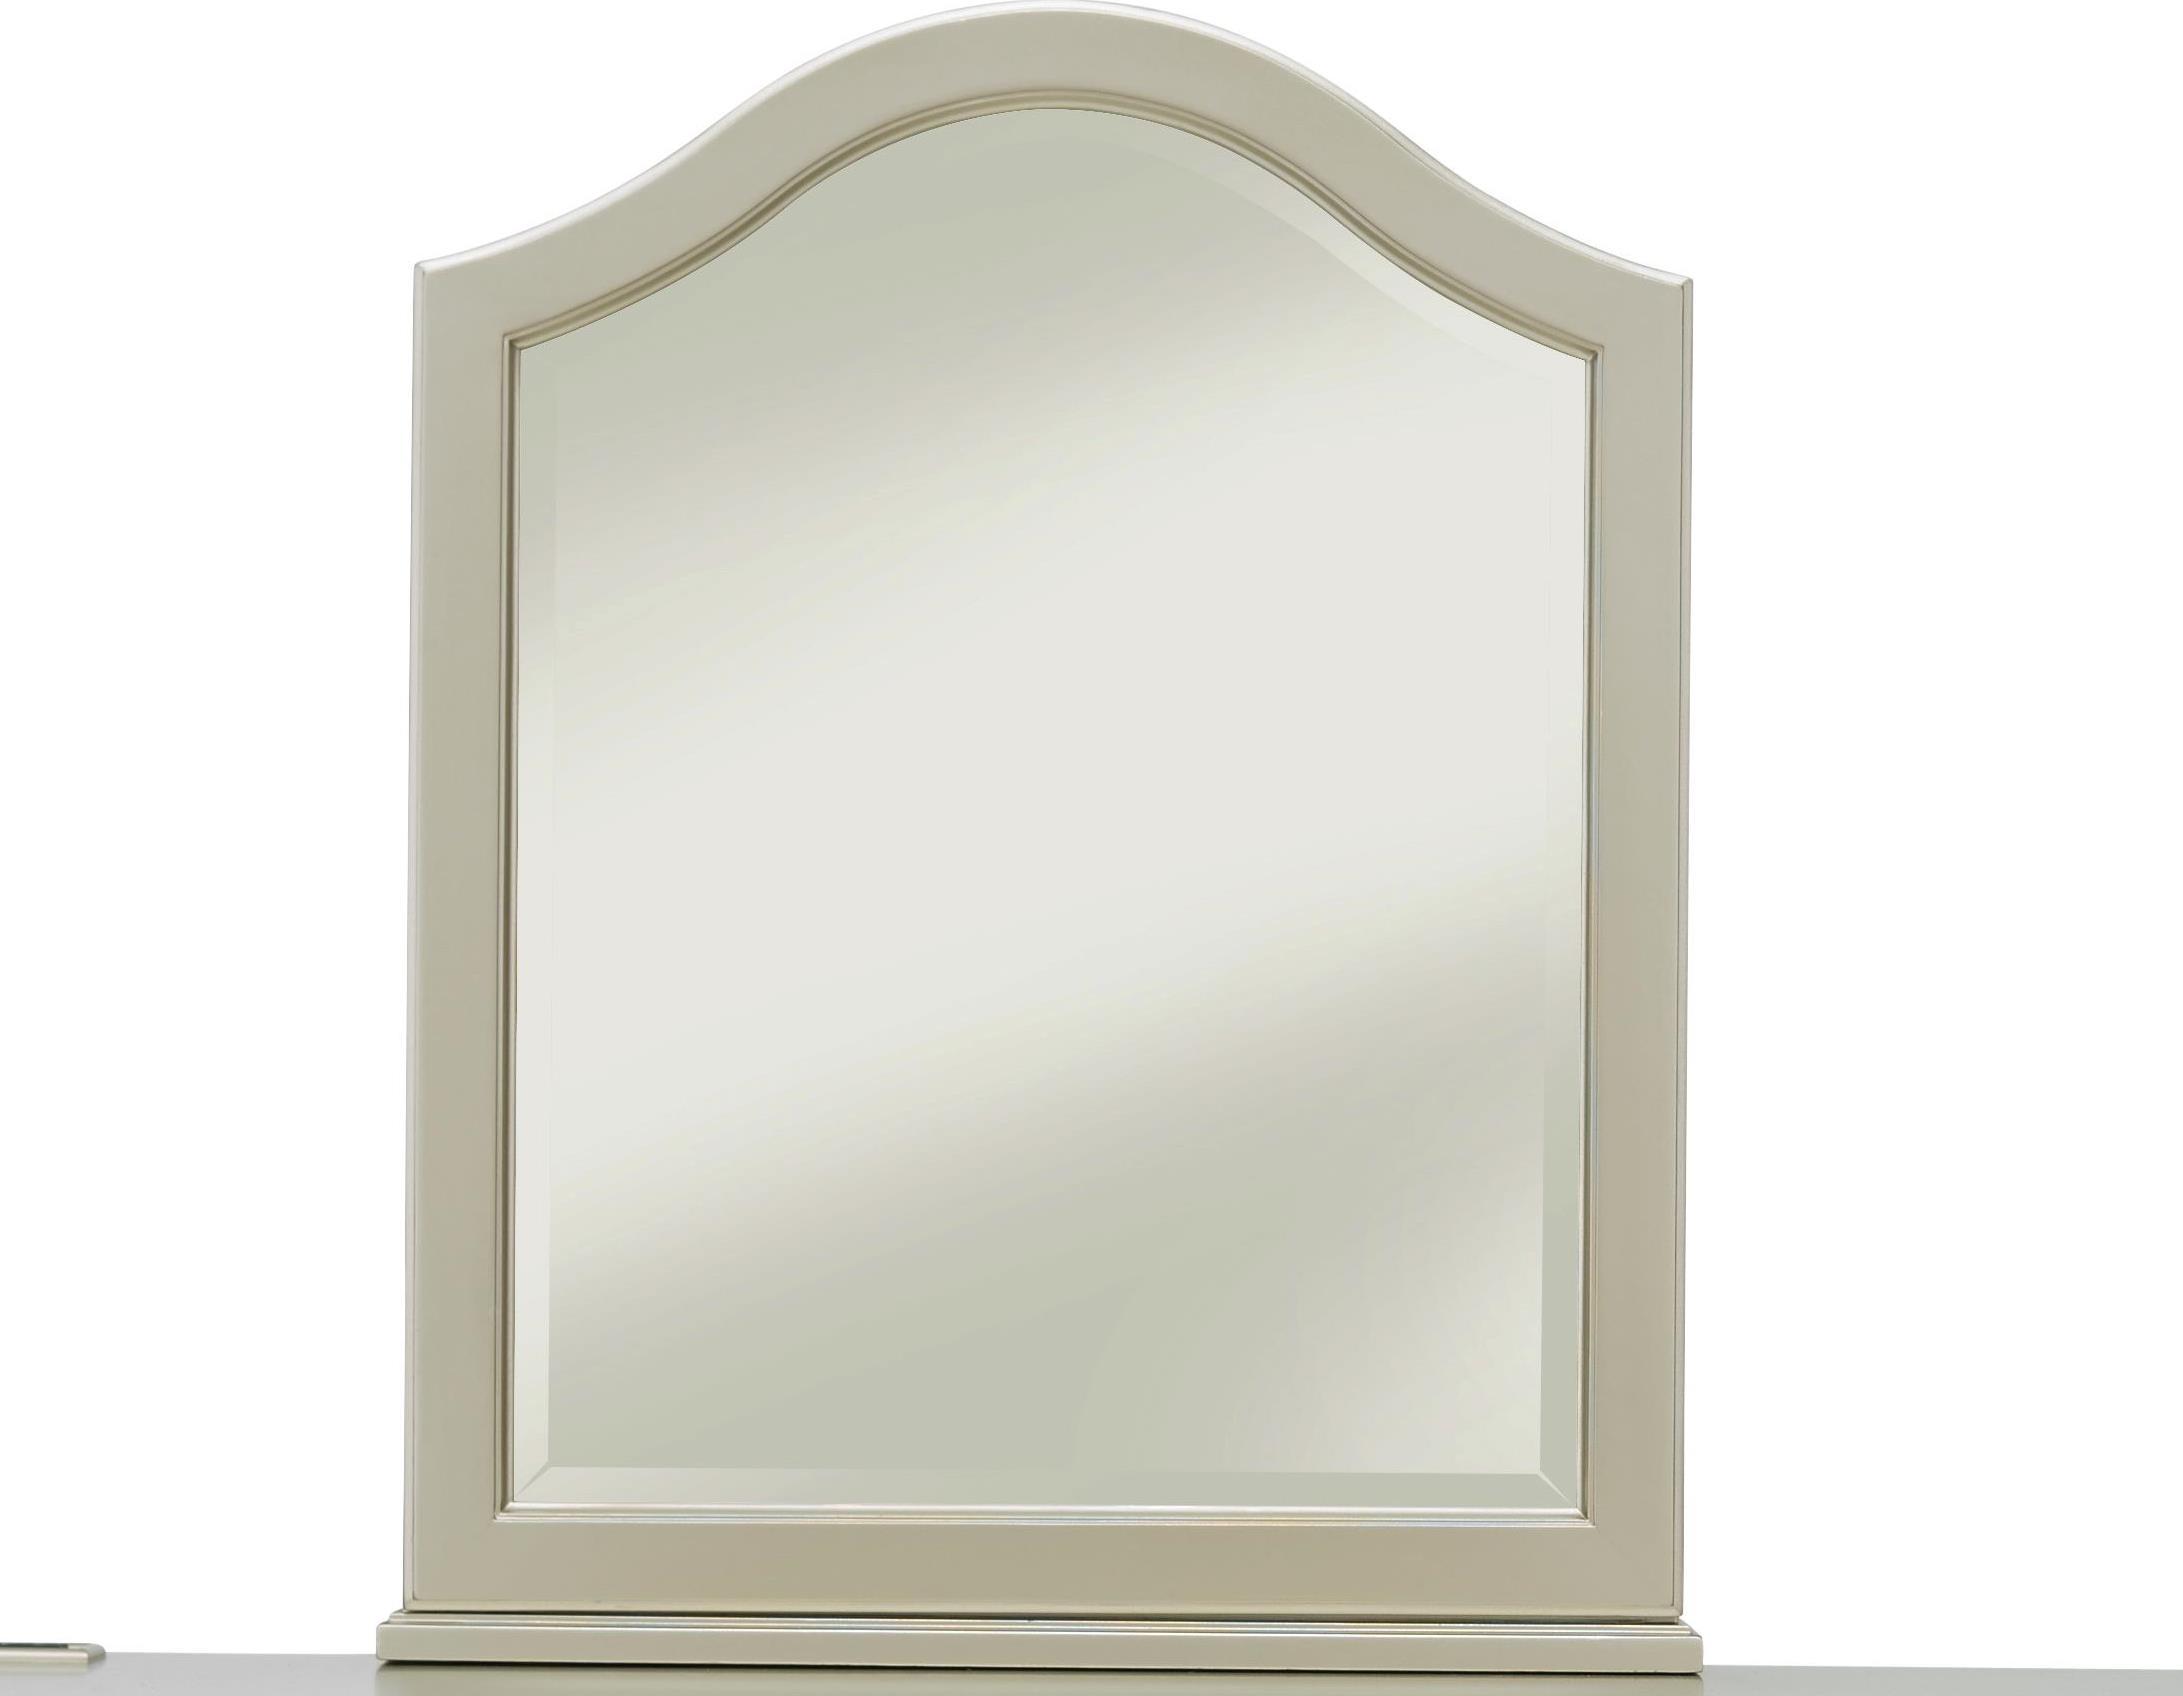 Lil South Beach Vanity Mirror